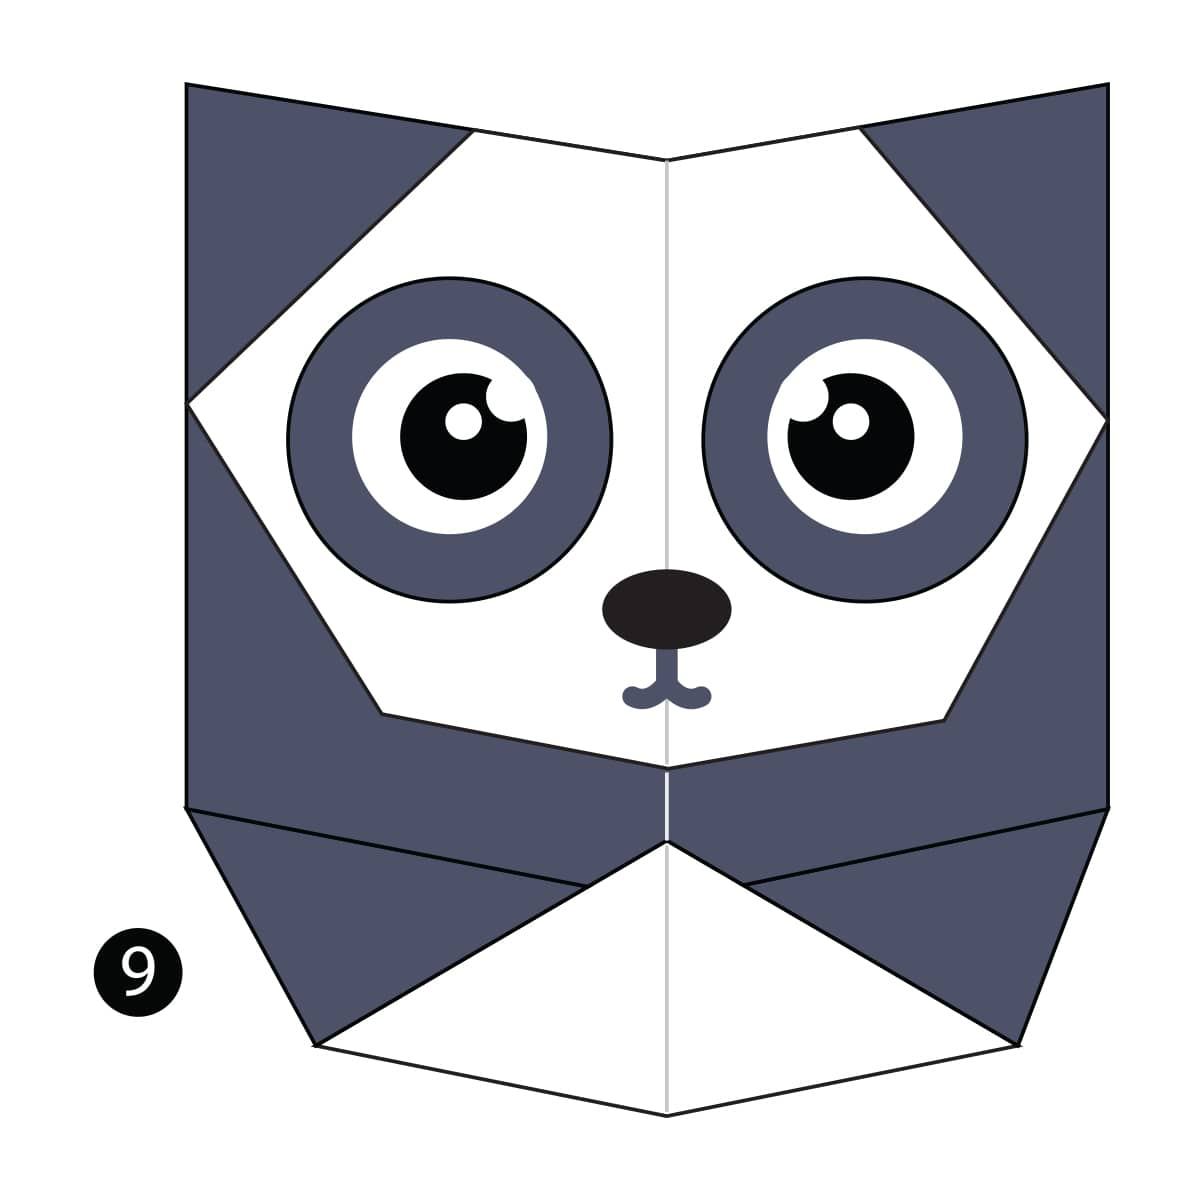 How to Make an Easy Origami Panda | 1200x1200